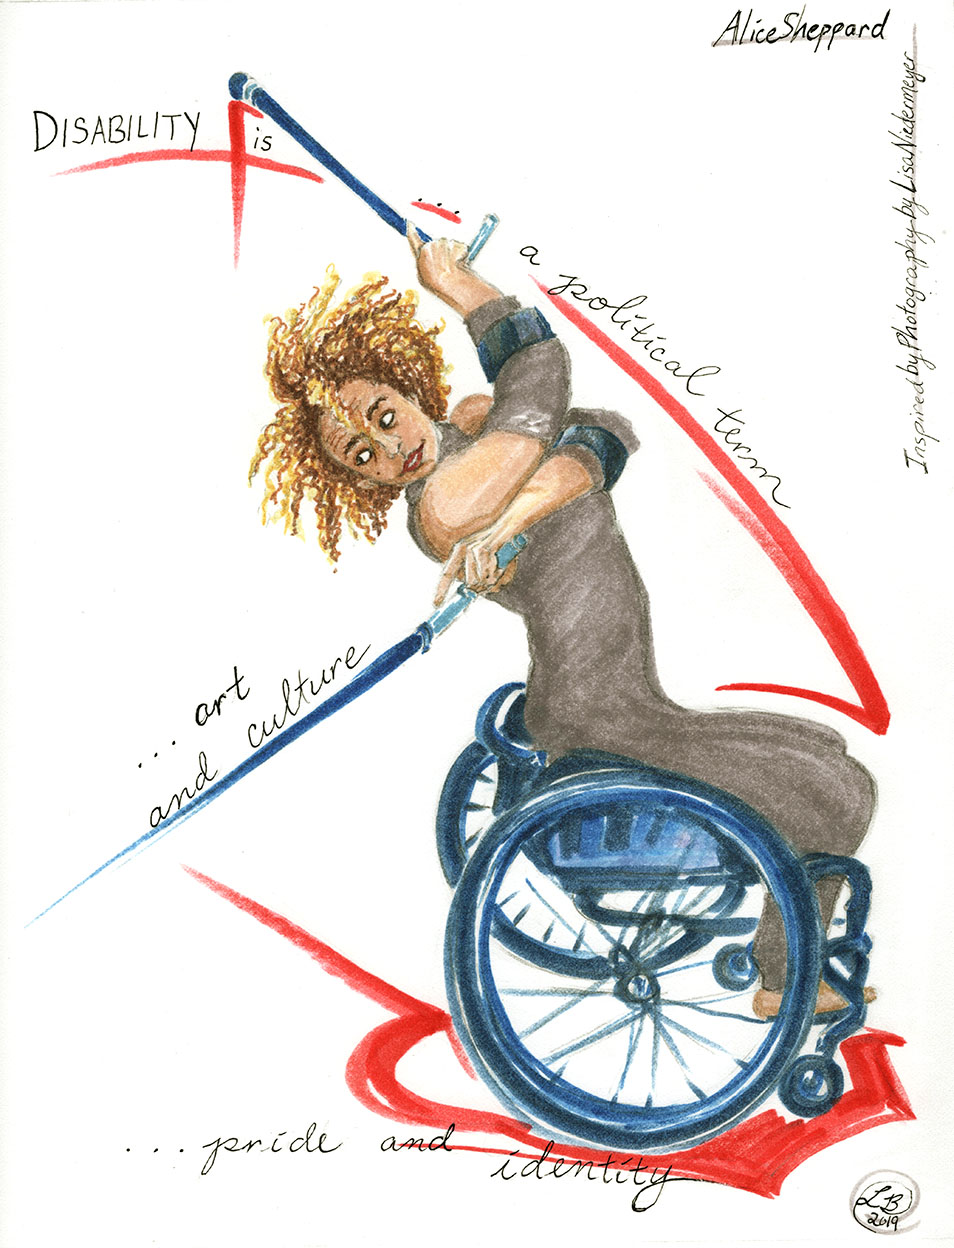 Dance&Disability_AliceSheppard_v.03_Brent_2019.04.25